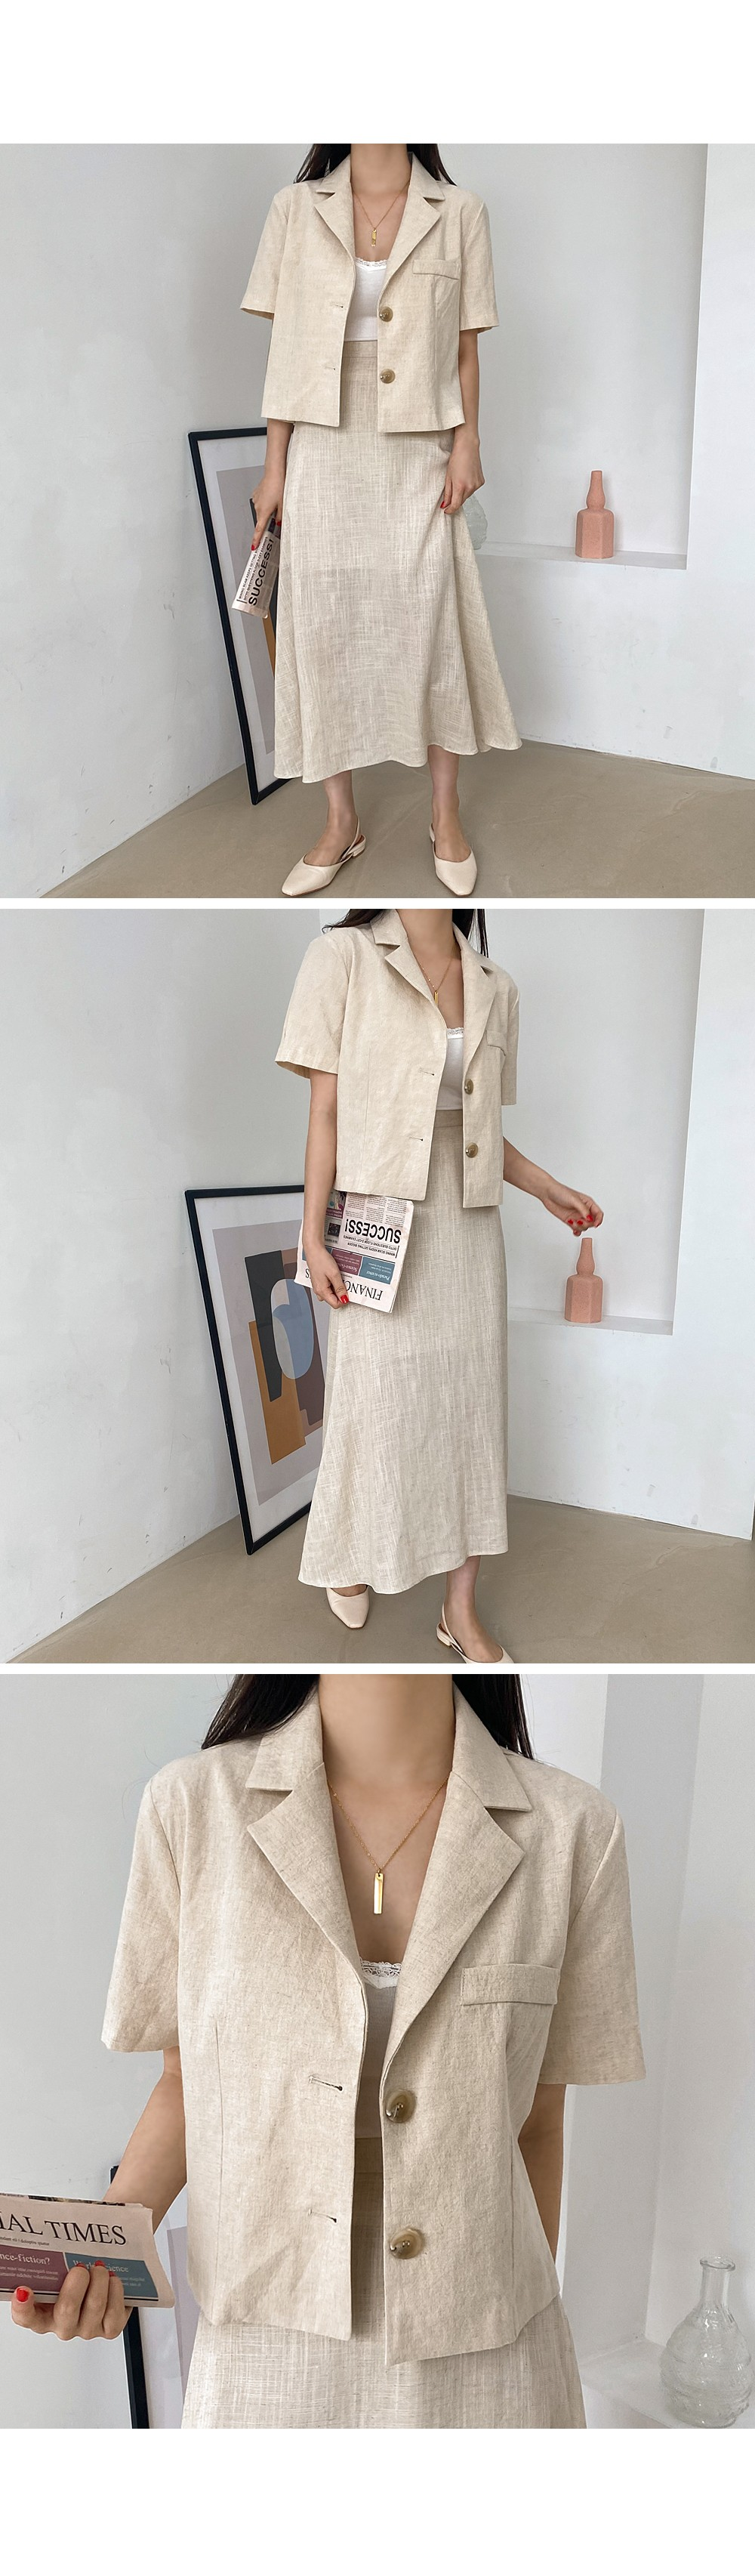 Mary Yu Linen JK